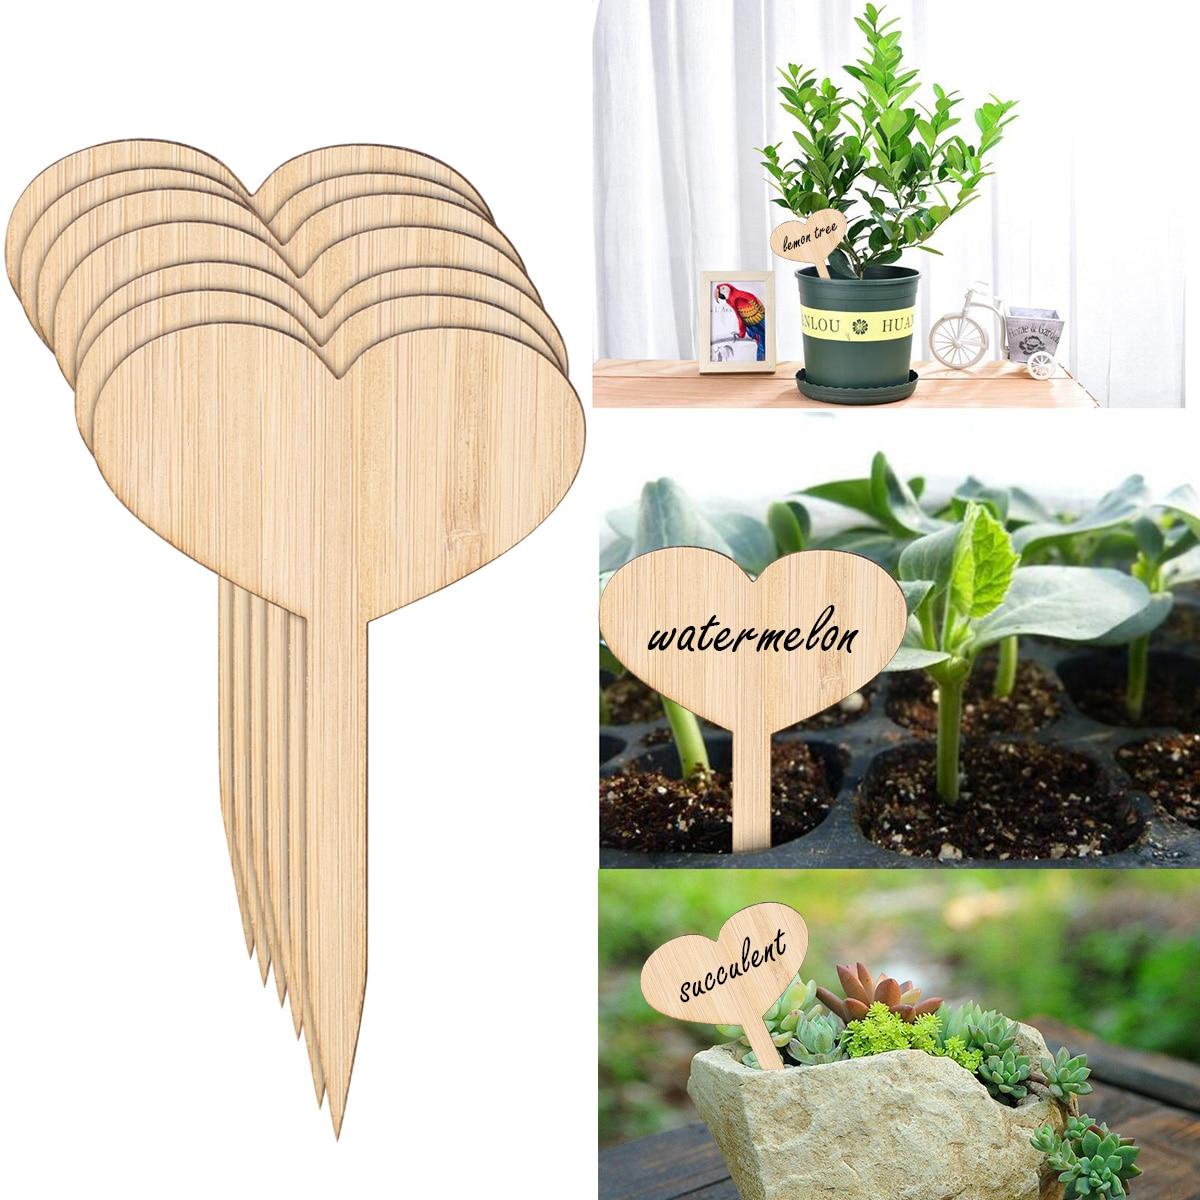 50pcs Natural Bamboo Plant Seed Labels